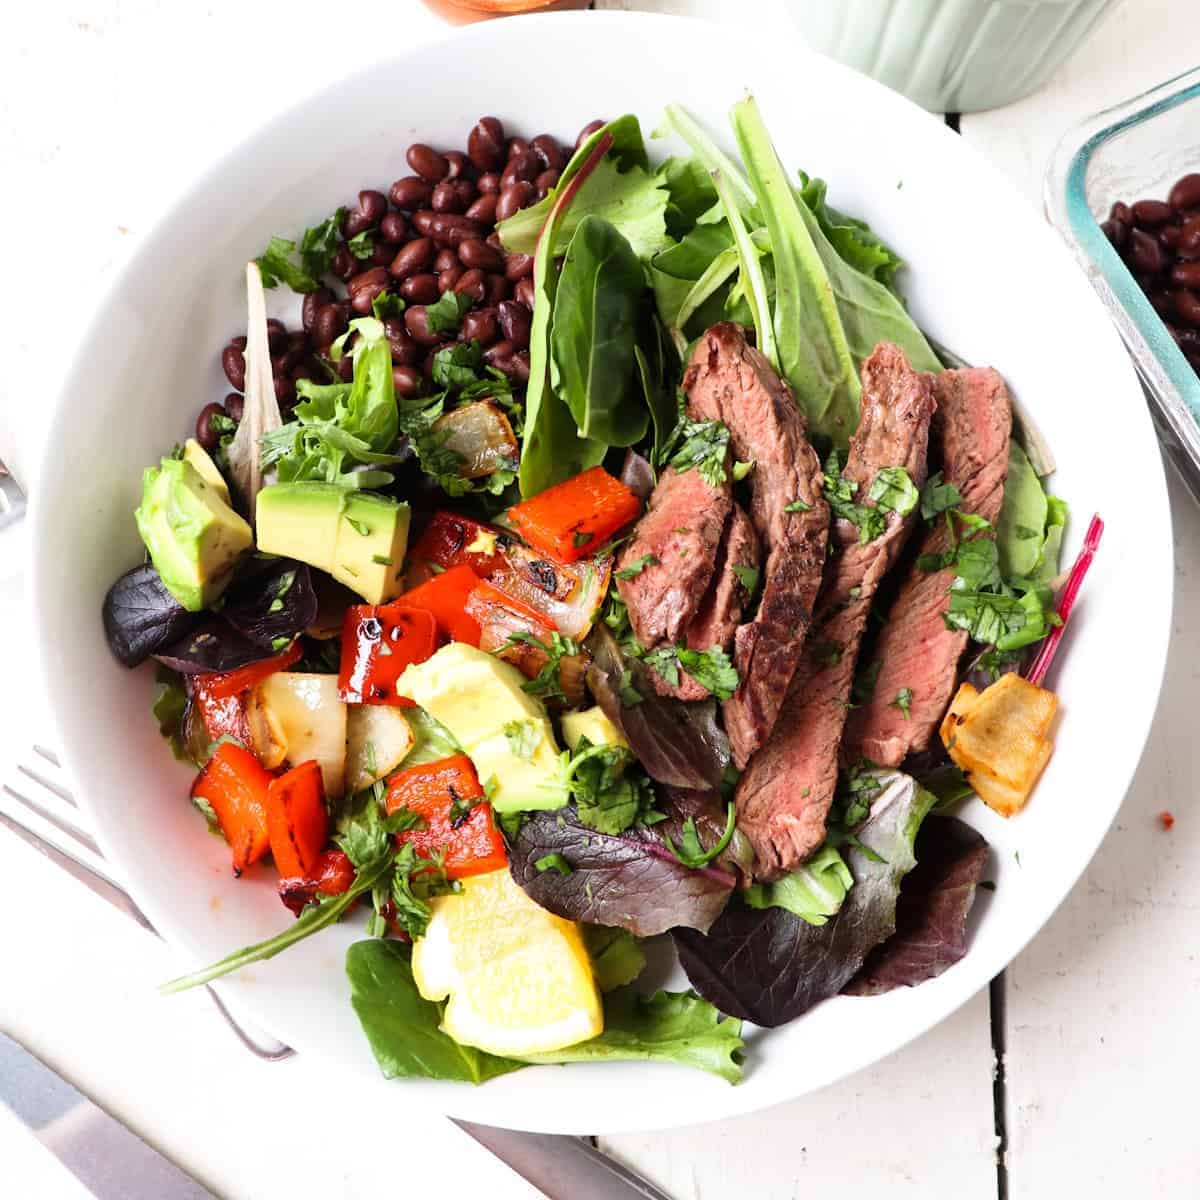 steak fajita salad featured